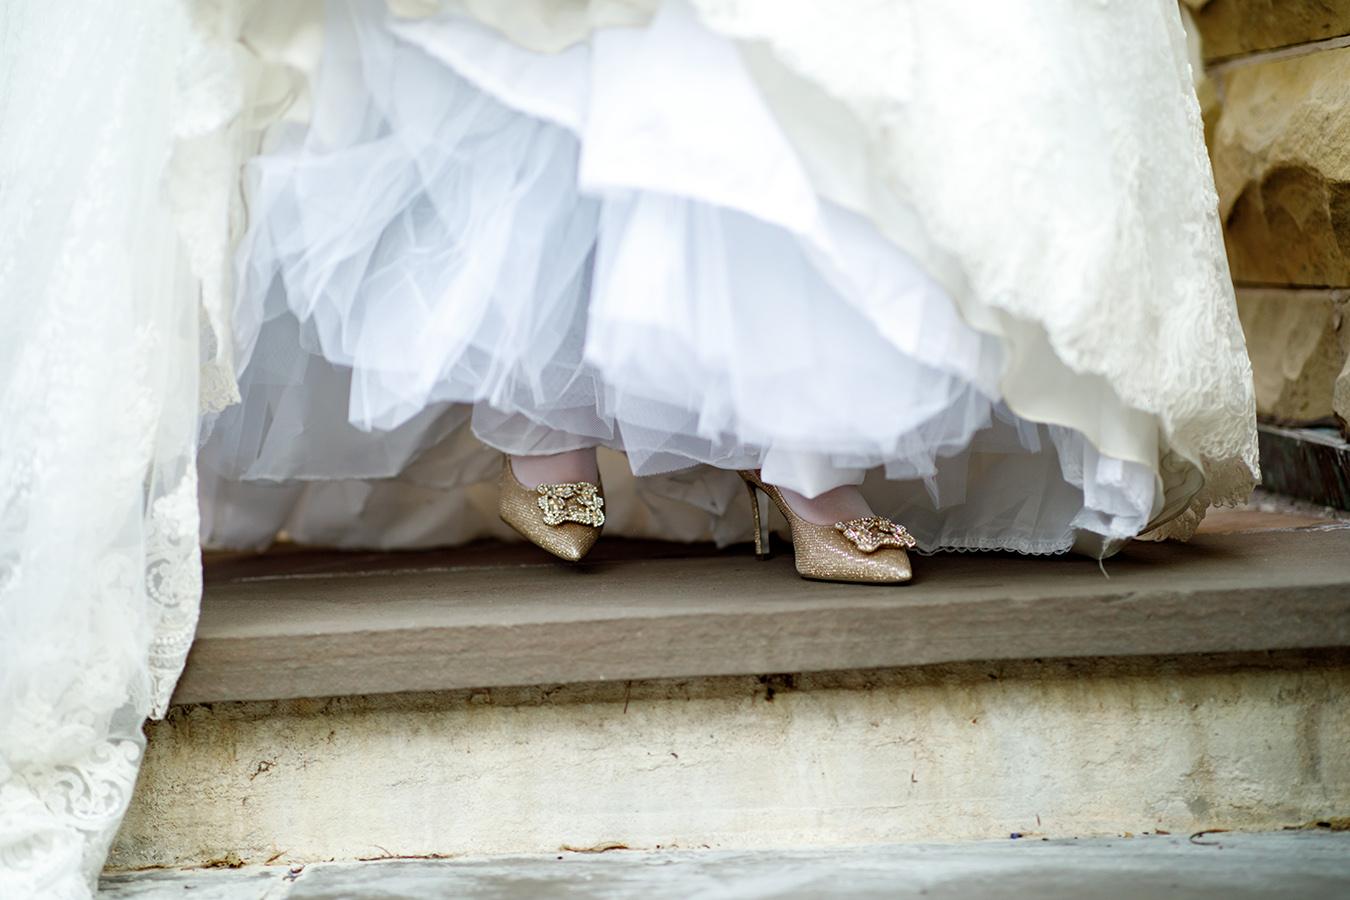 Jess' fairy tale wedding shoes were gold Manolo Blahnik Hangisi pumps.